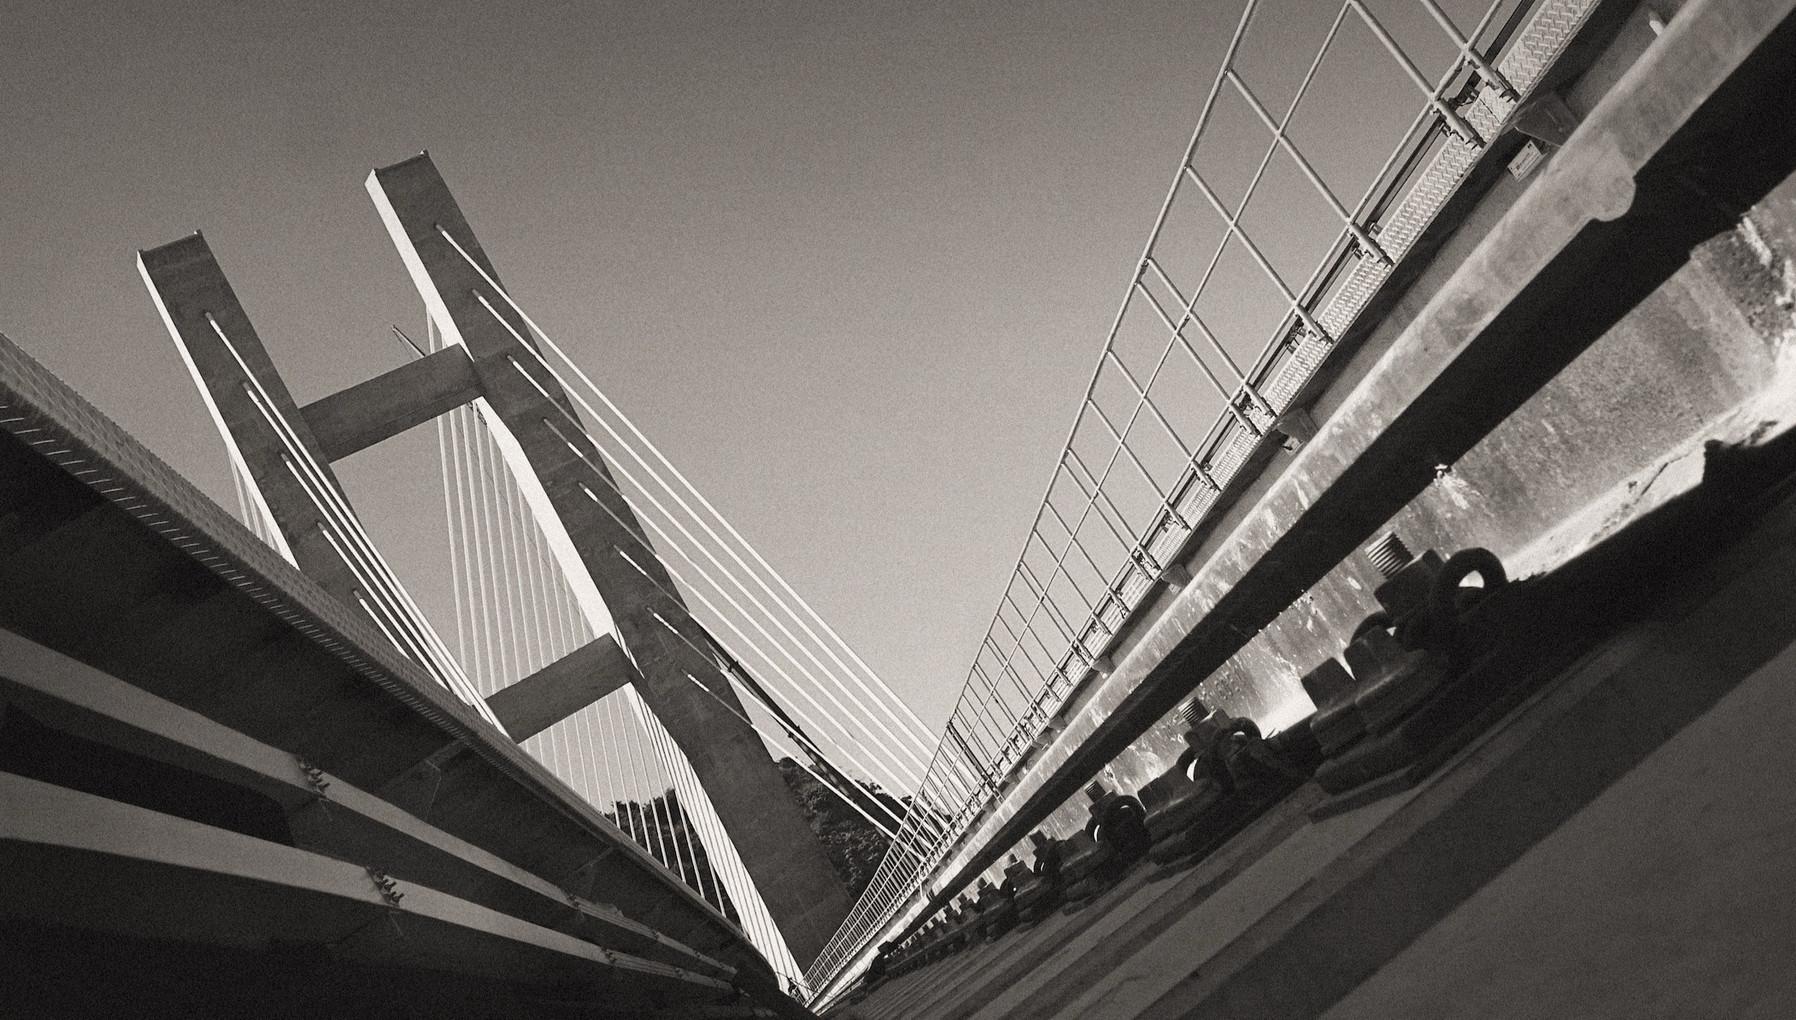 199-ground-bridge_edited.jpg